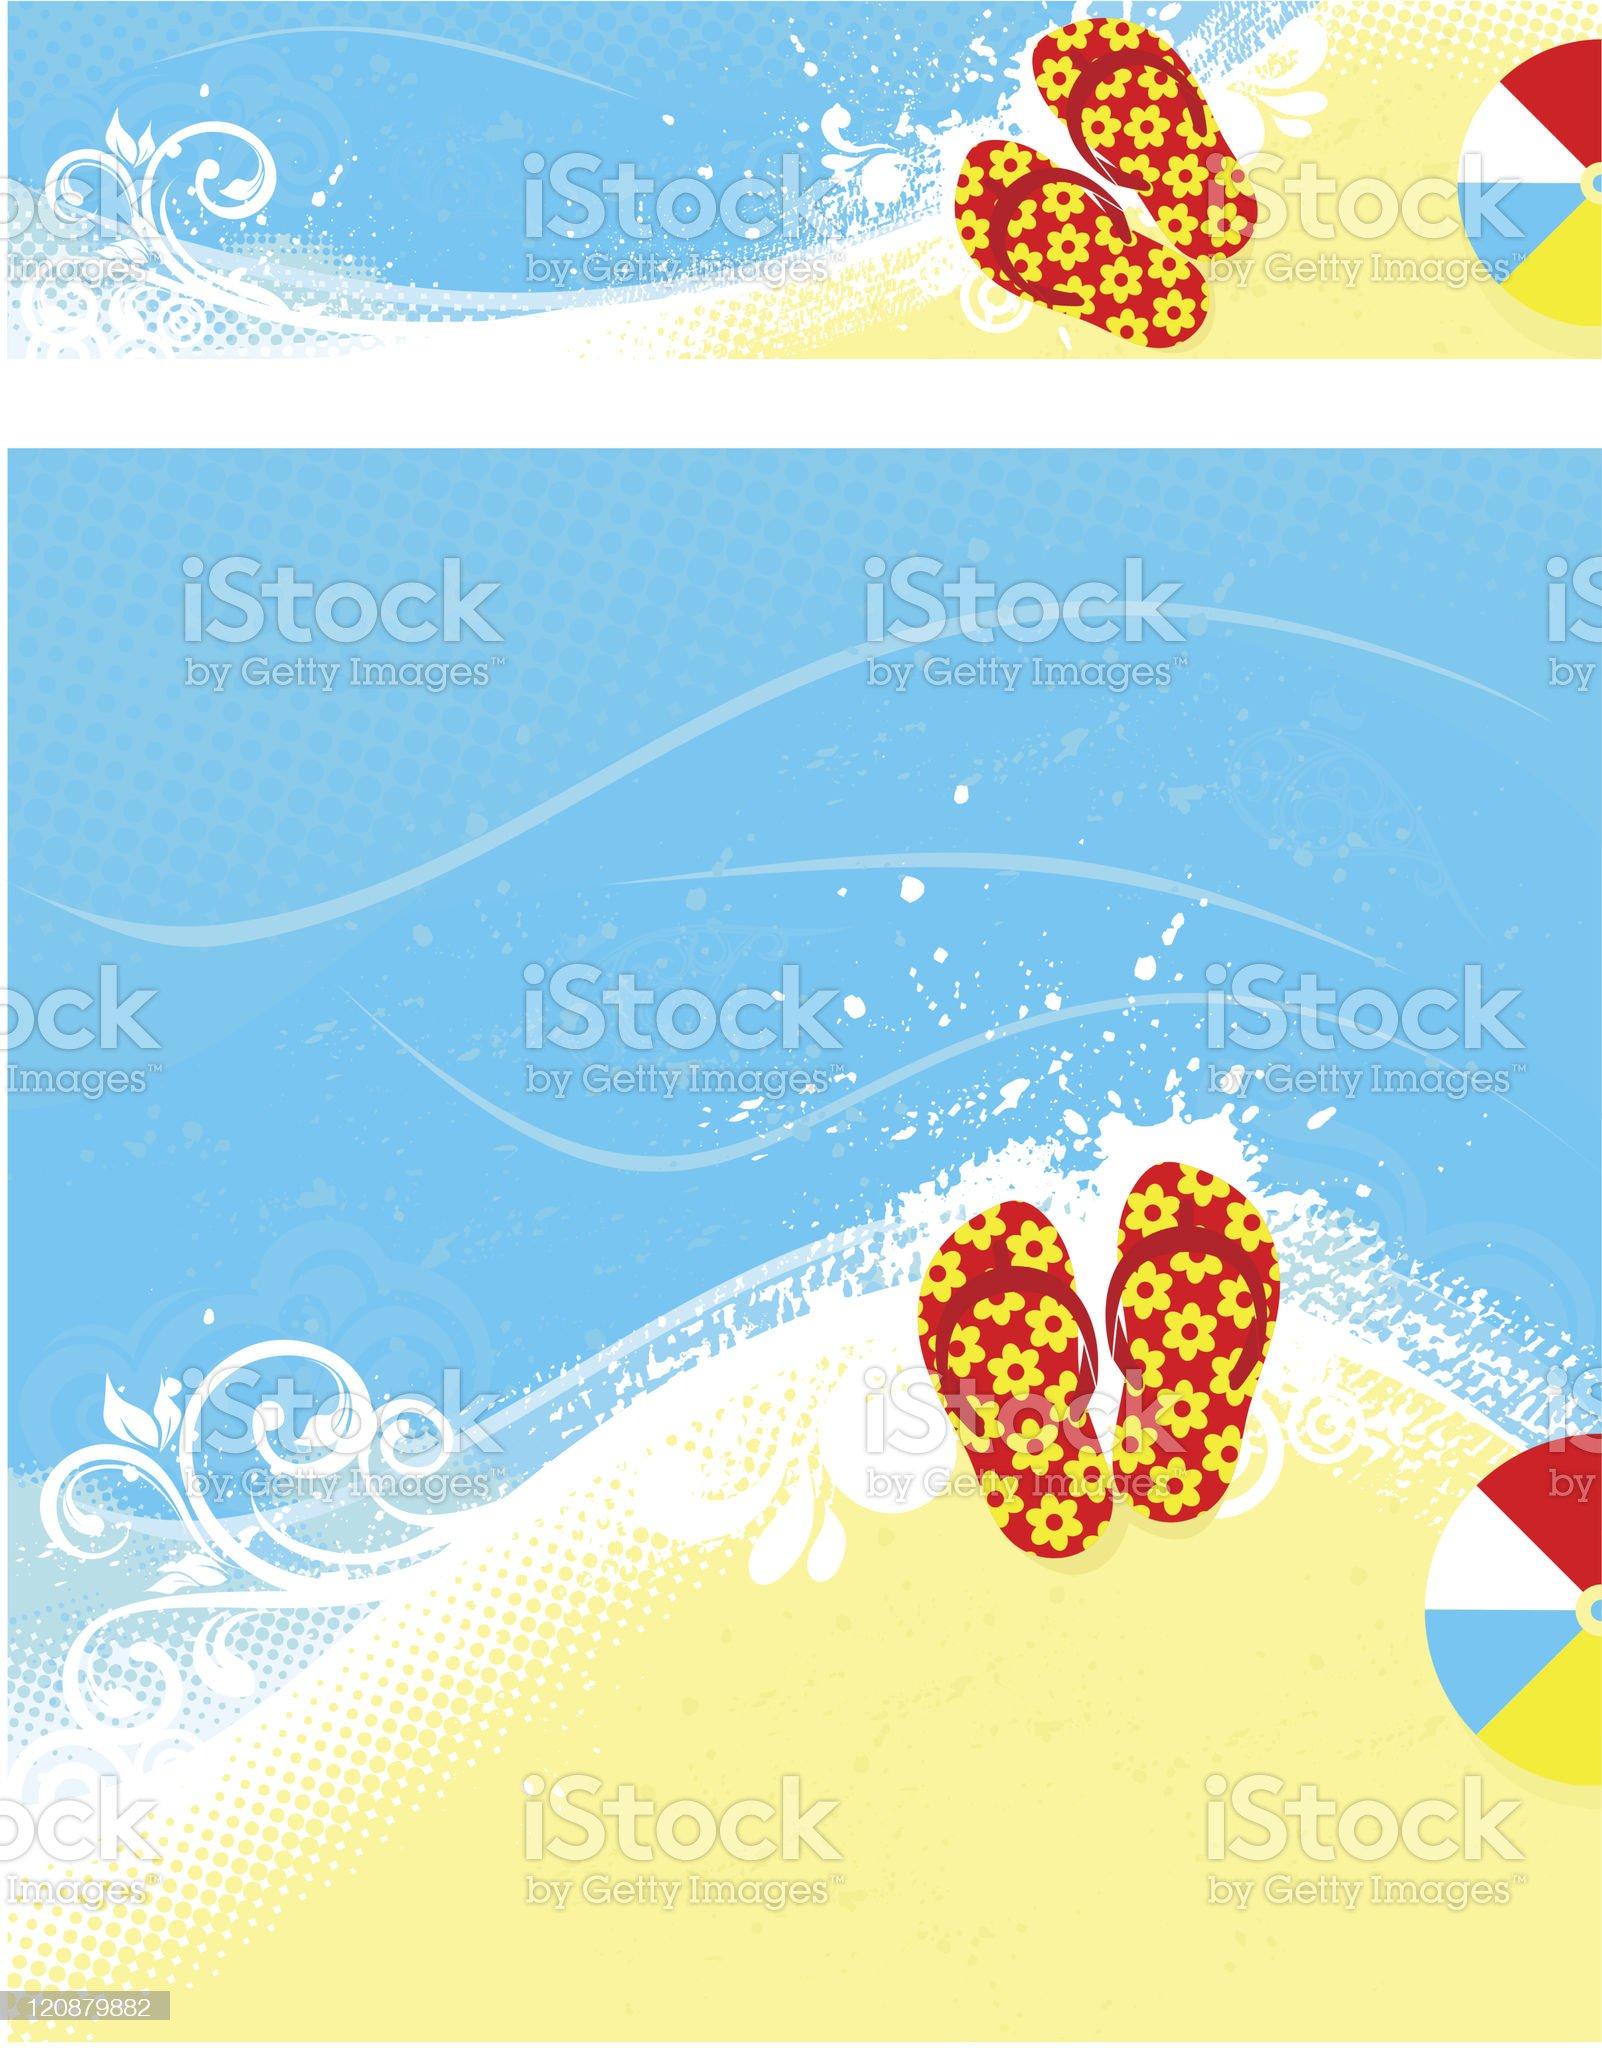 Summer banners set royalty-free stock vector art